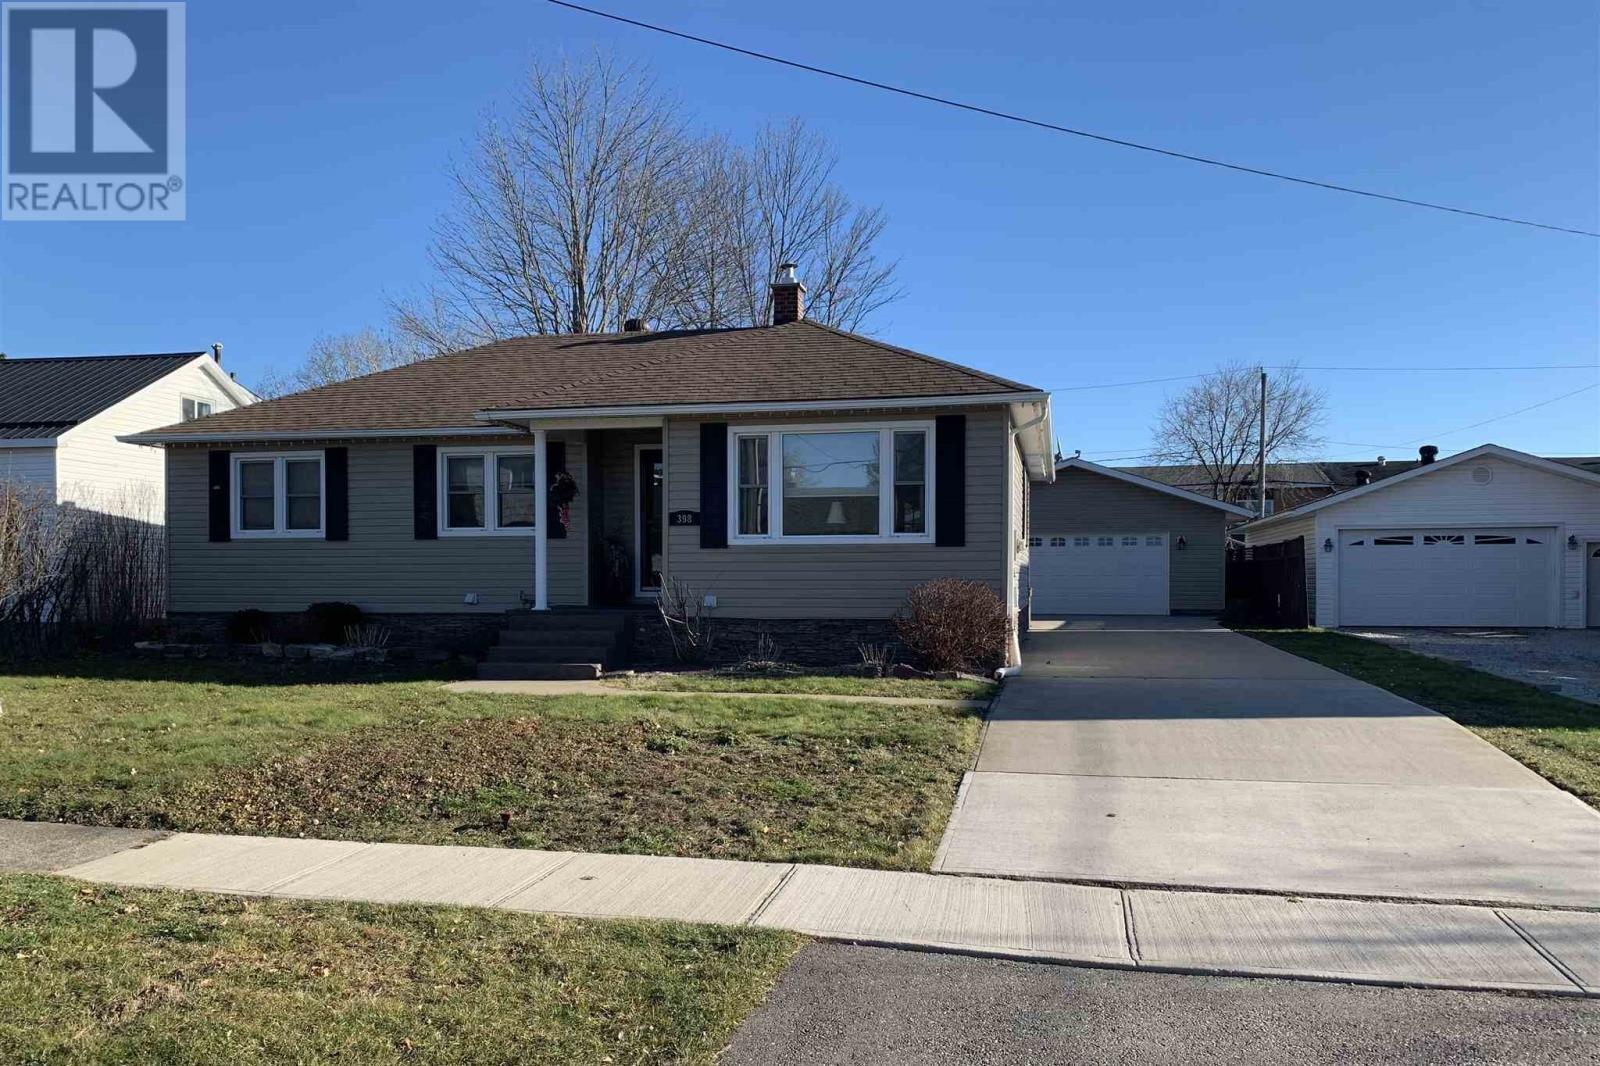 House for sale at 398 Elizabeth St Sault Ste. Marie Ontario - MLS: SM130386